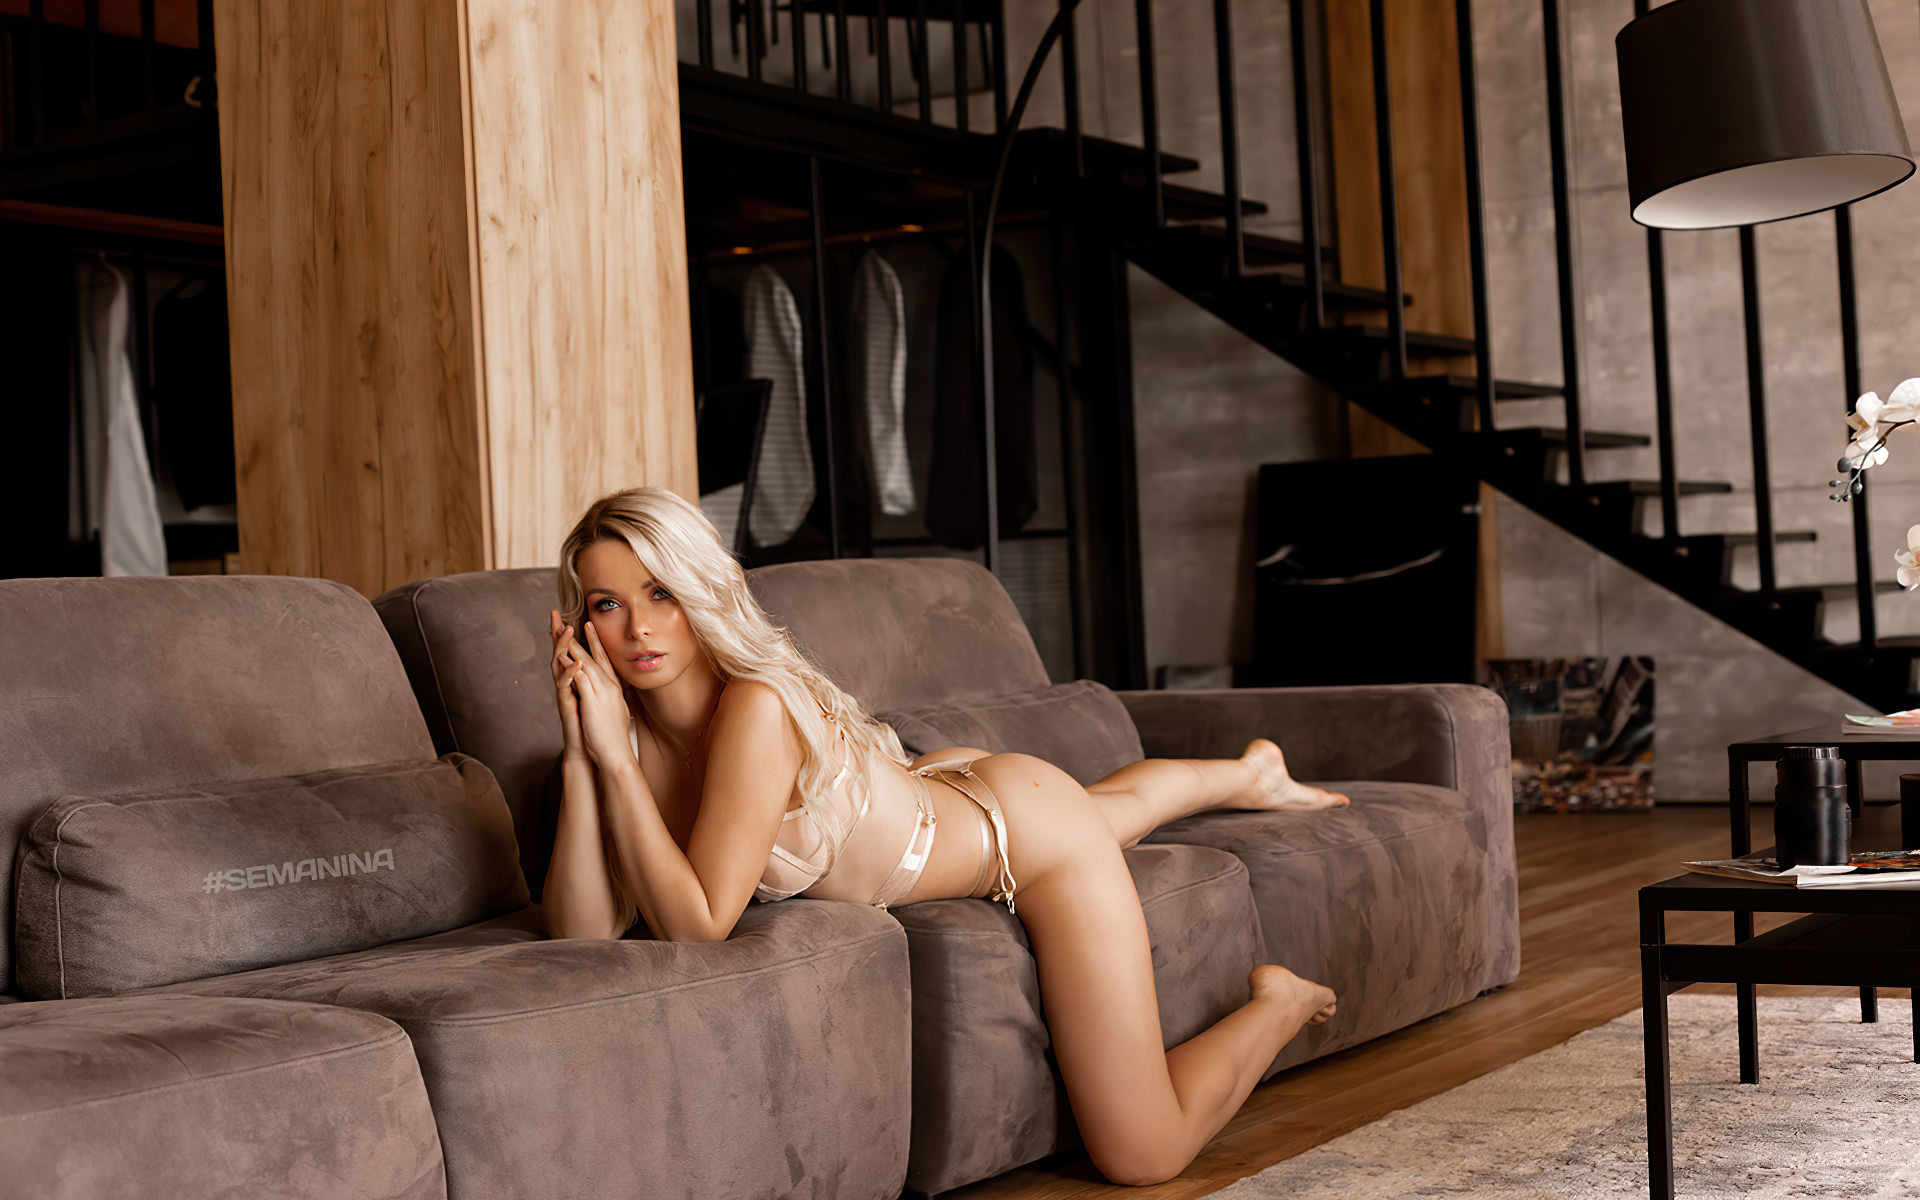 women, ekaterina enokaeva, svetlana semanina, svetlana nikonova, blonde, ass, lingerie, lamp, couch, stairs, women indoors, brunette